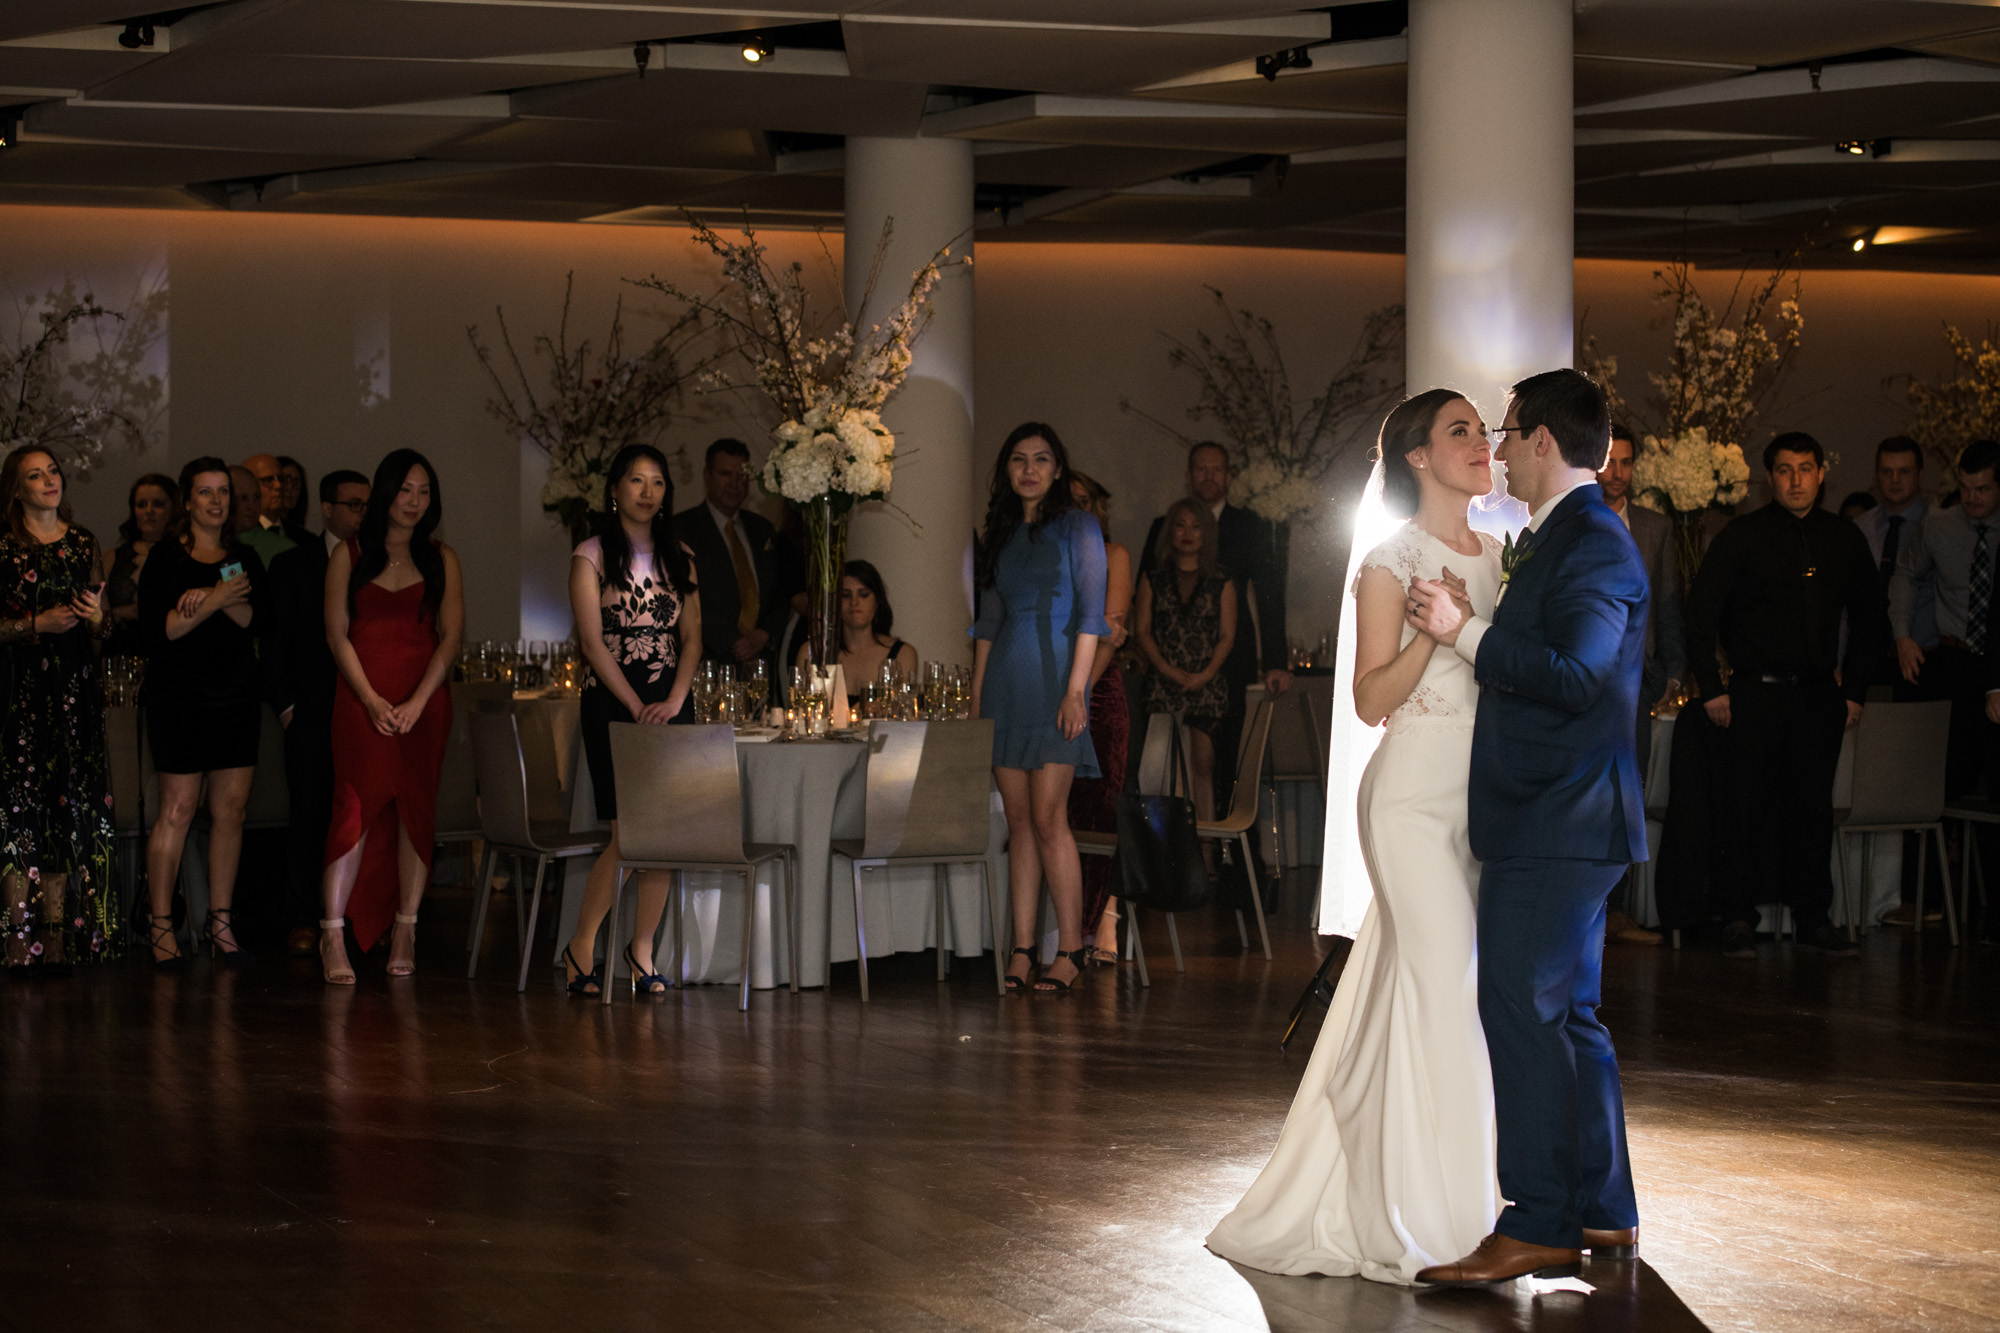 nj-wedding-photographer-maritime-parc-maria-david-46.jpg